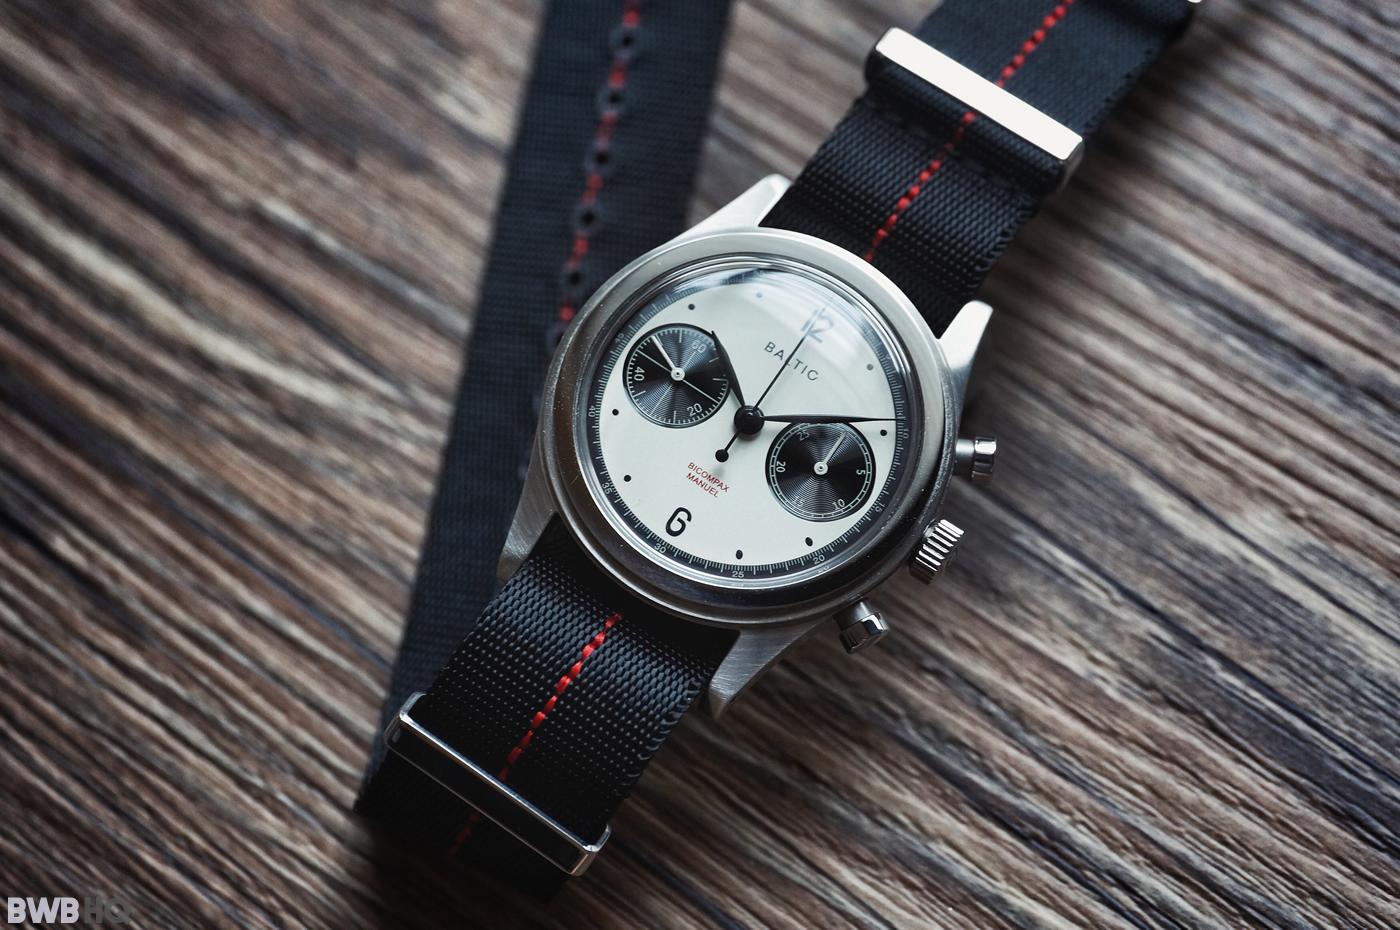 Red Stripe NATO Strap With Baltic Panda Watch